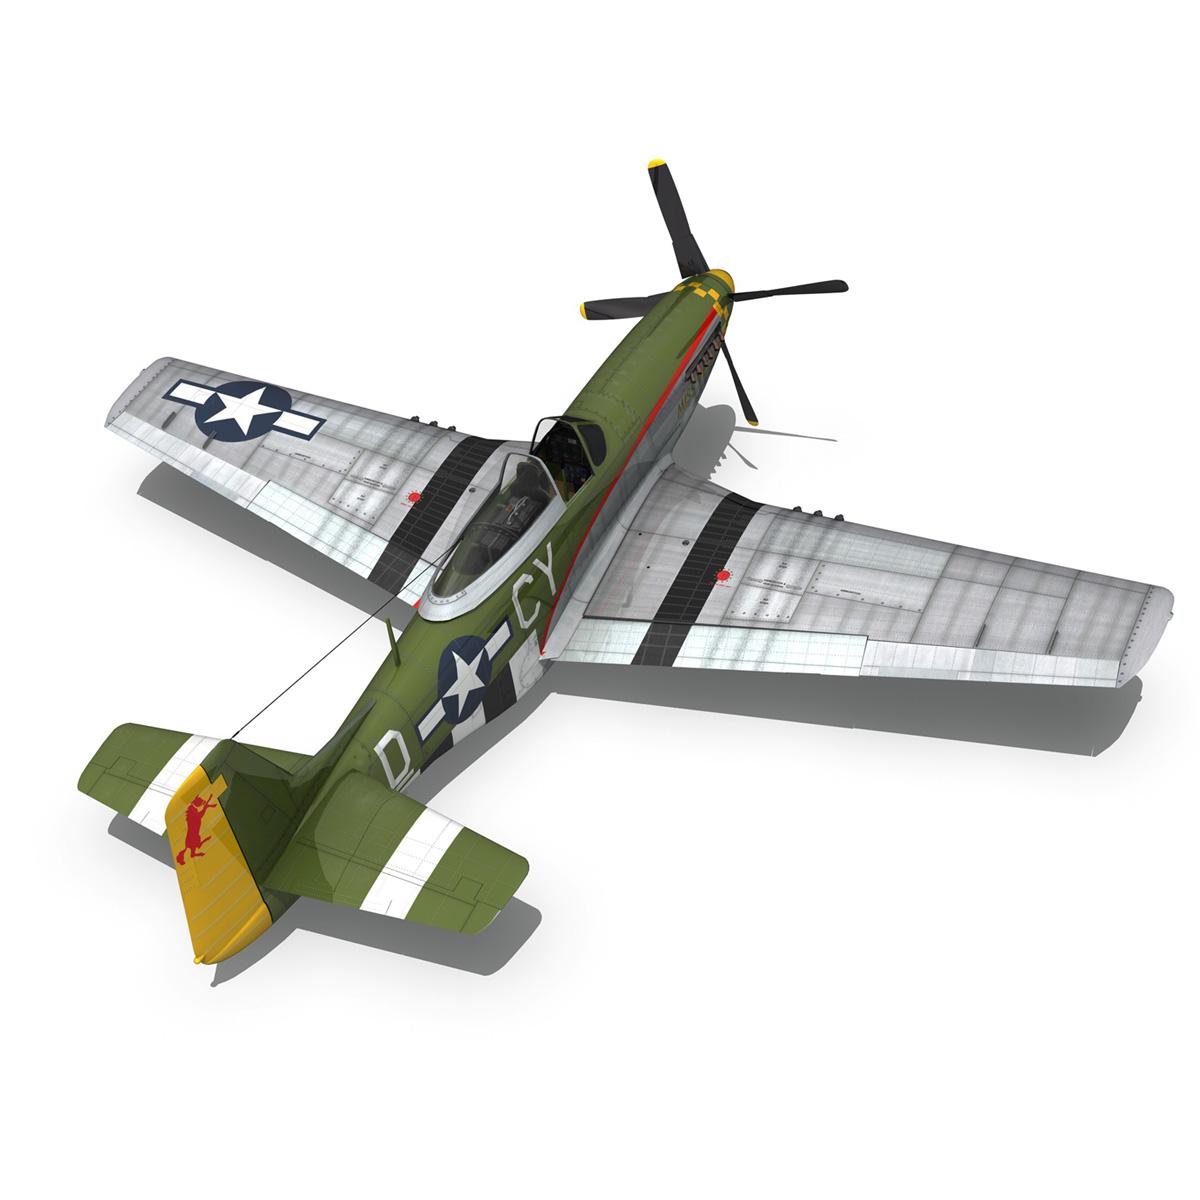 north american p-51d – mustang – miss velma 3d model 3ds fbx c4d lwo obj 267629